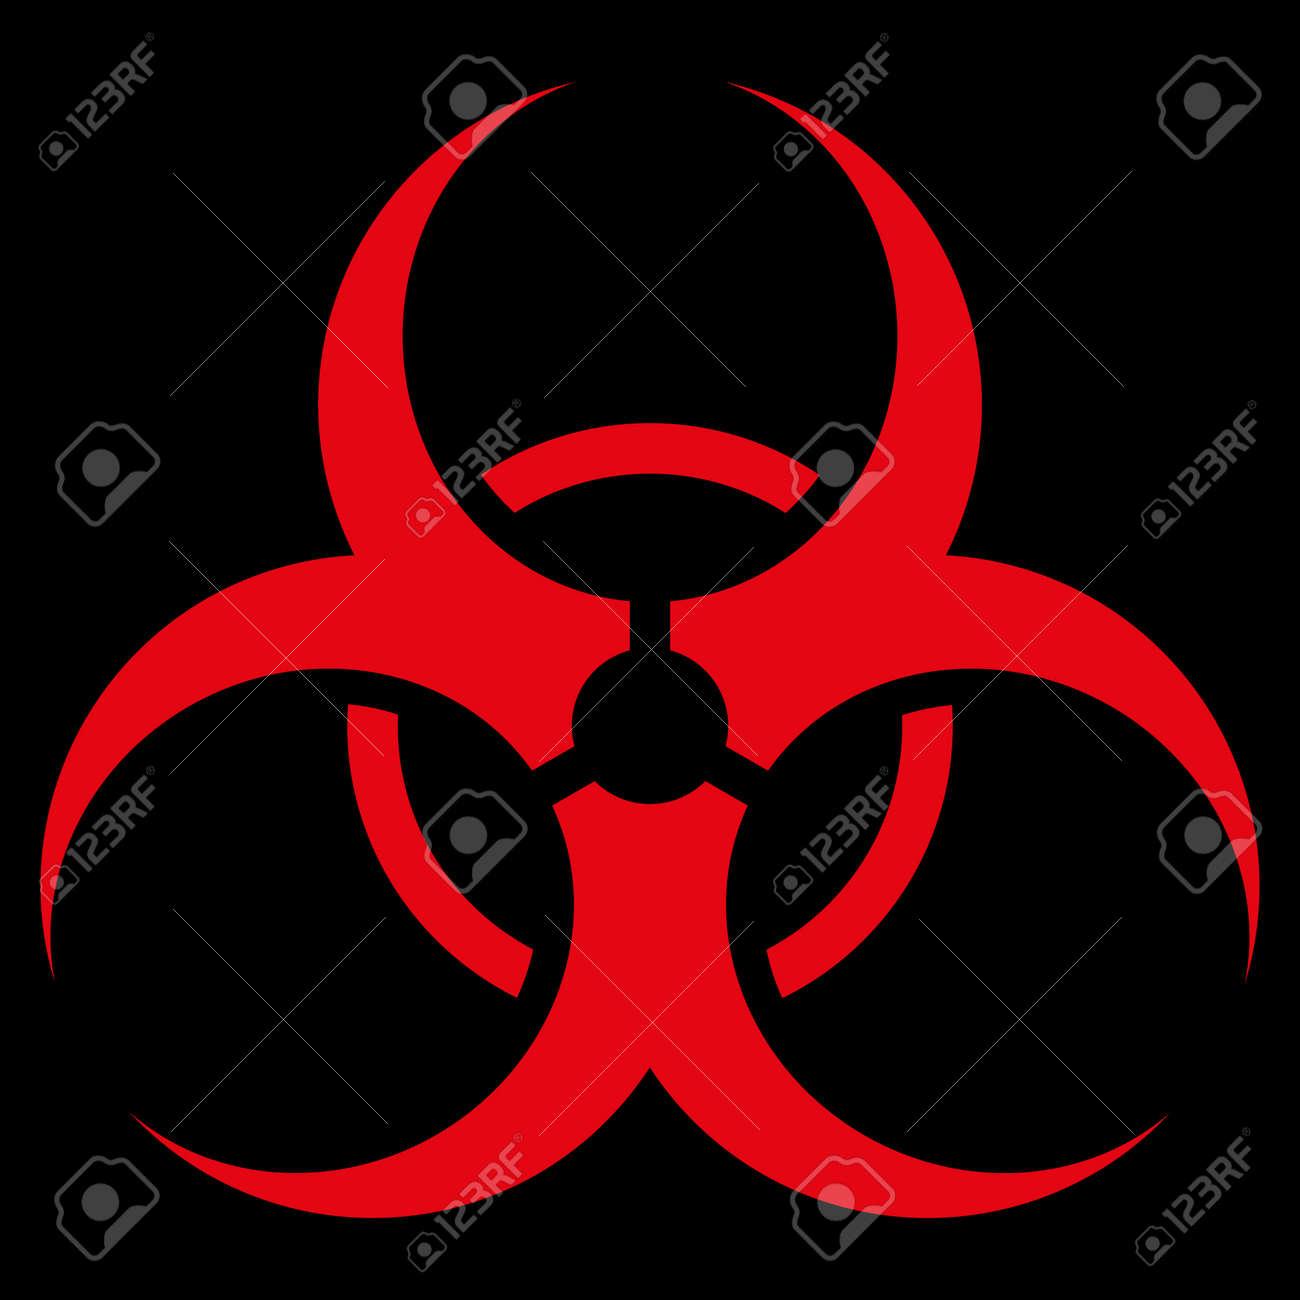 Biohazard symbol raster icon style is flat symbol red color biohazard symbol raster icon style is flat symbol red color rounded angles biocorpaavc Images